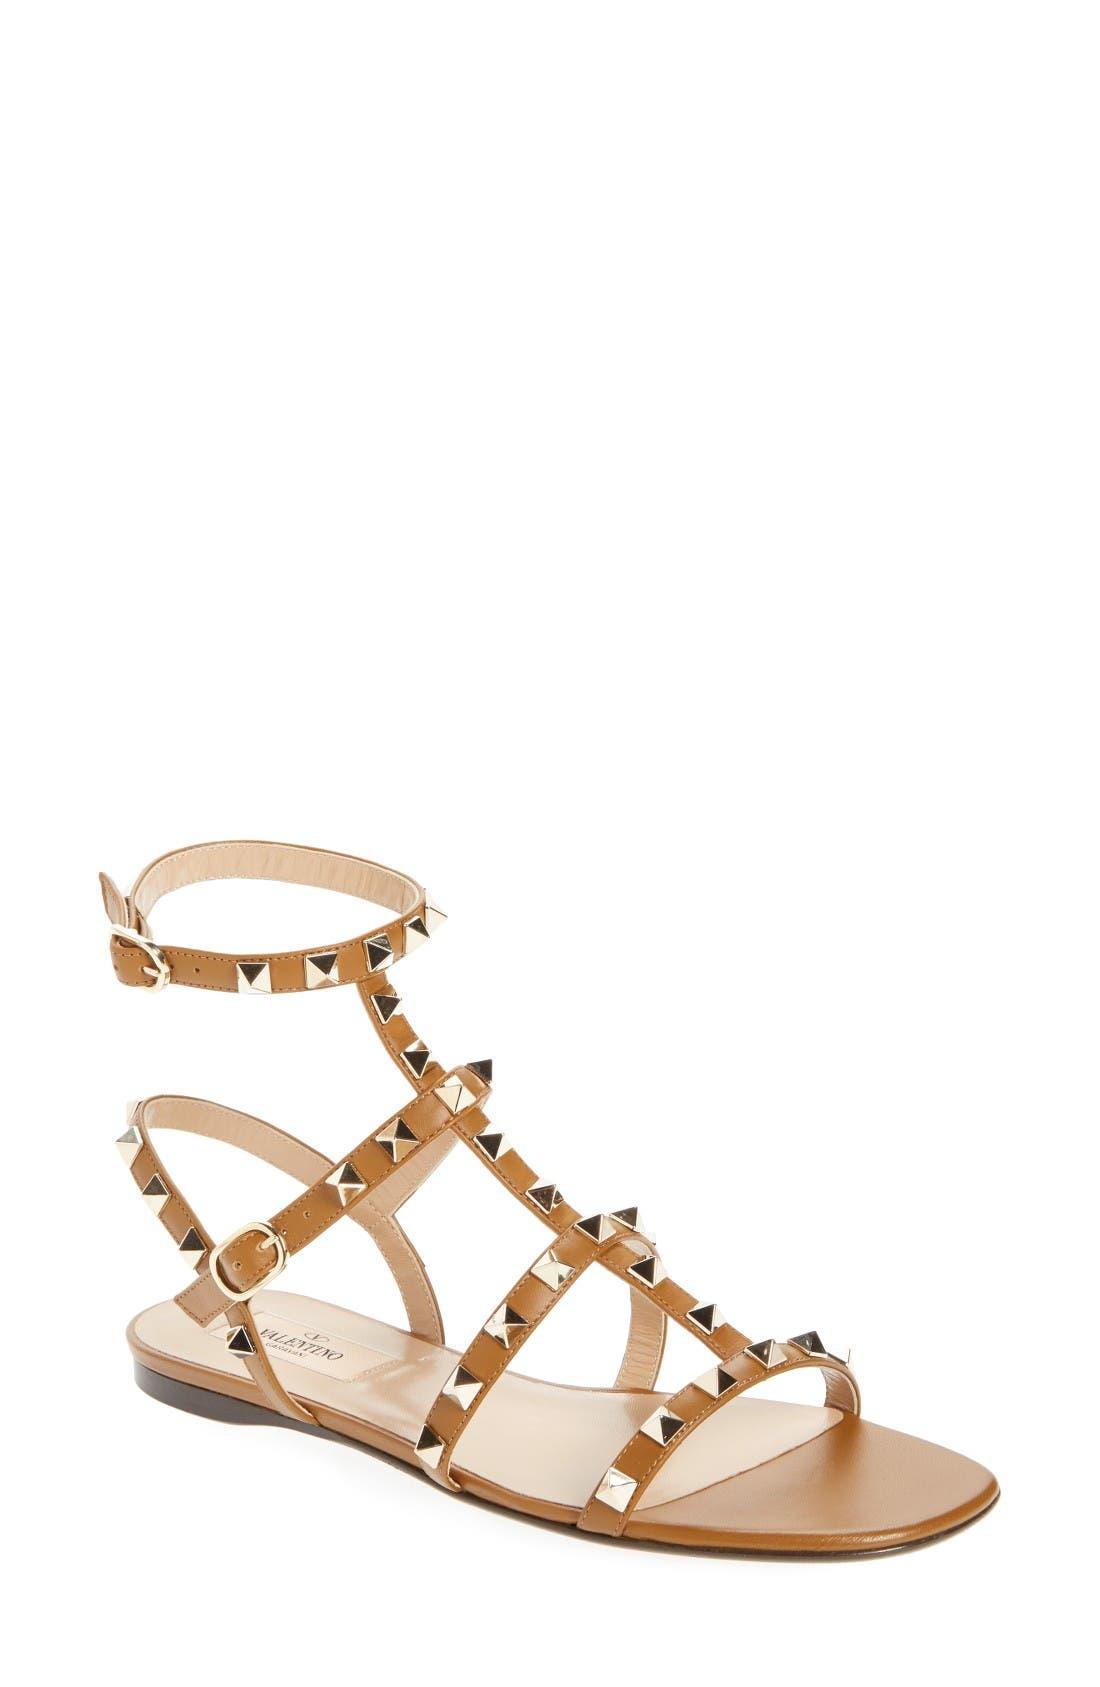 Rockstud Gladiator Sandal,                         Main,                         color, Brown